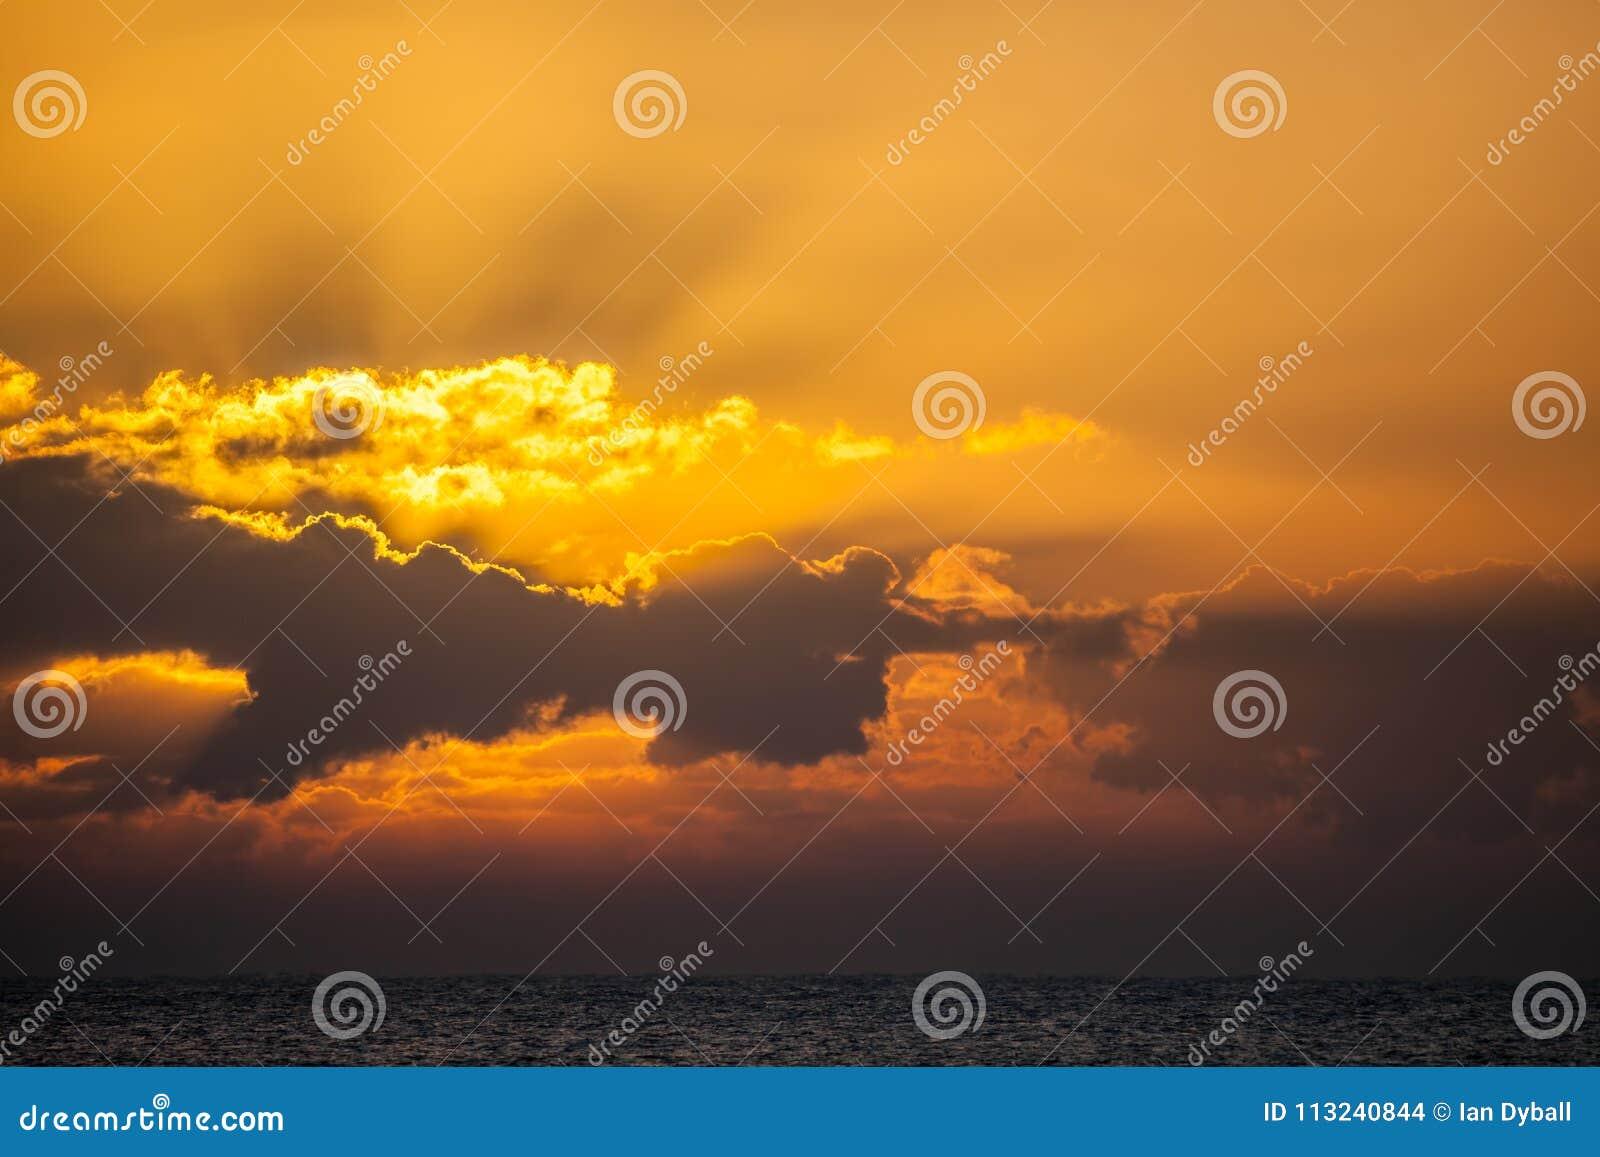 Sfondi tramonto alba